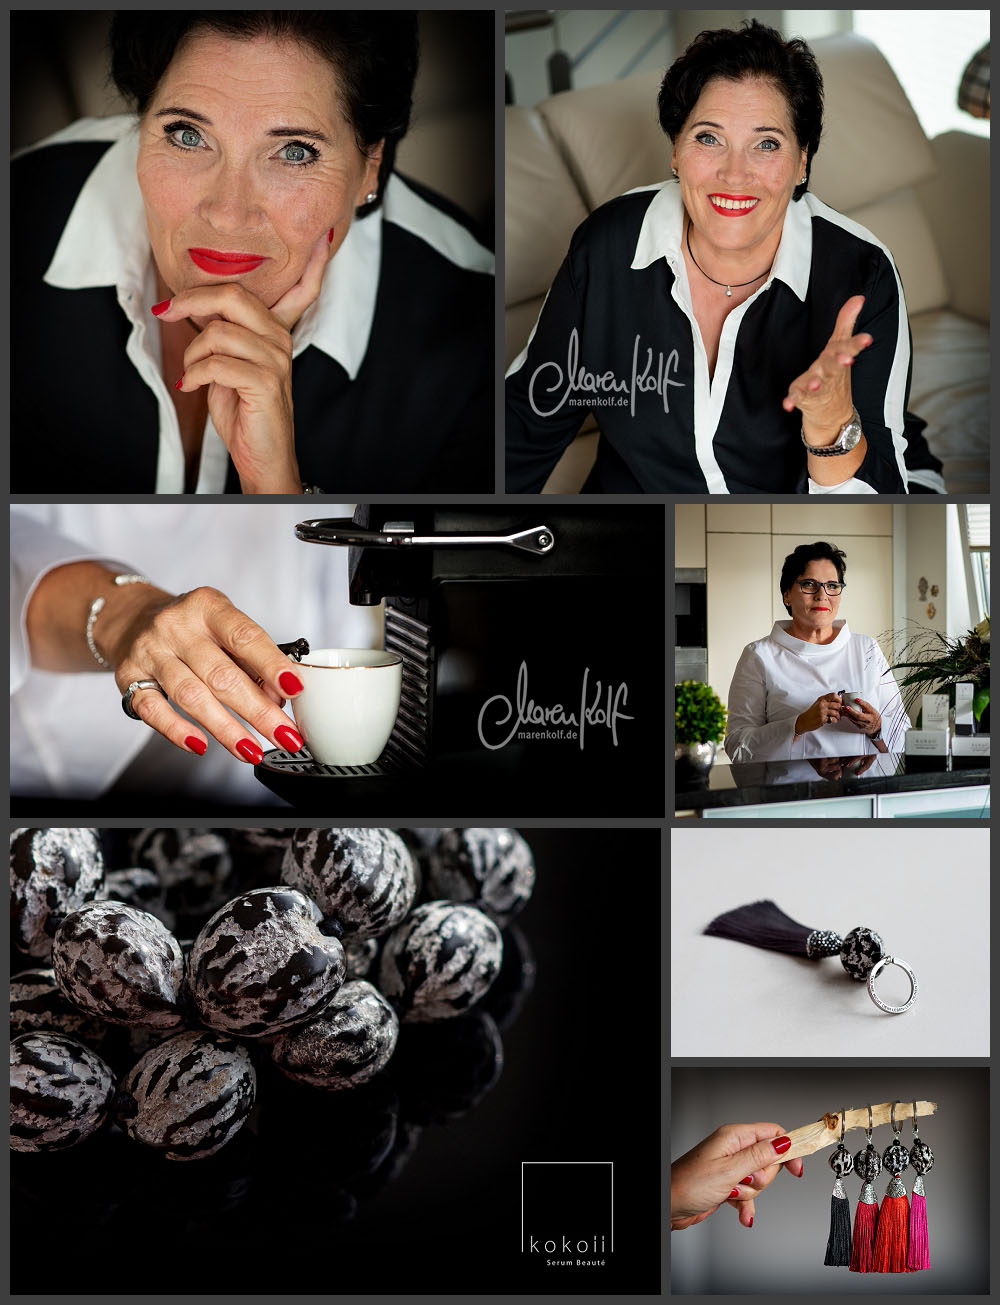 businessportraits-hannover-ulrike-alex-kokoii-kosmetikfotografie-maren-kolf-wedemark-2